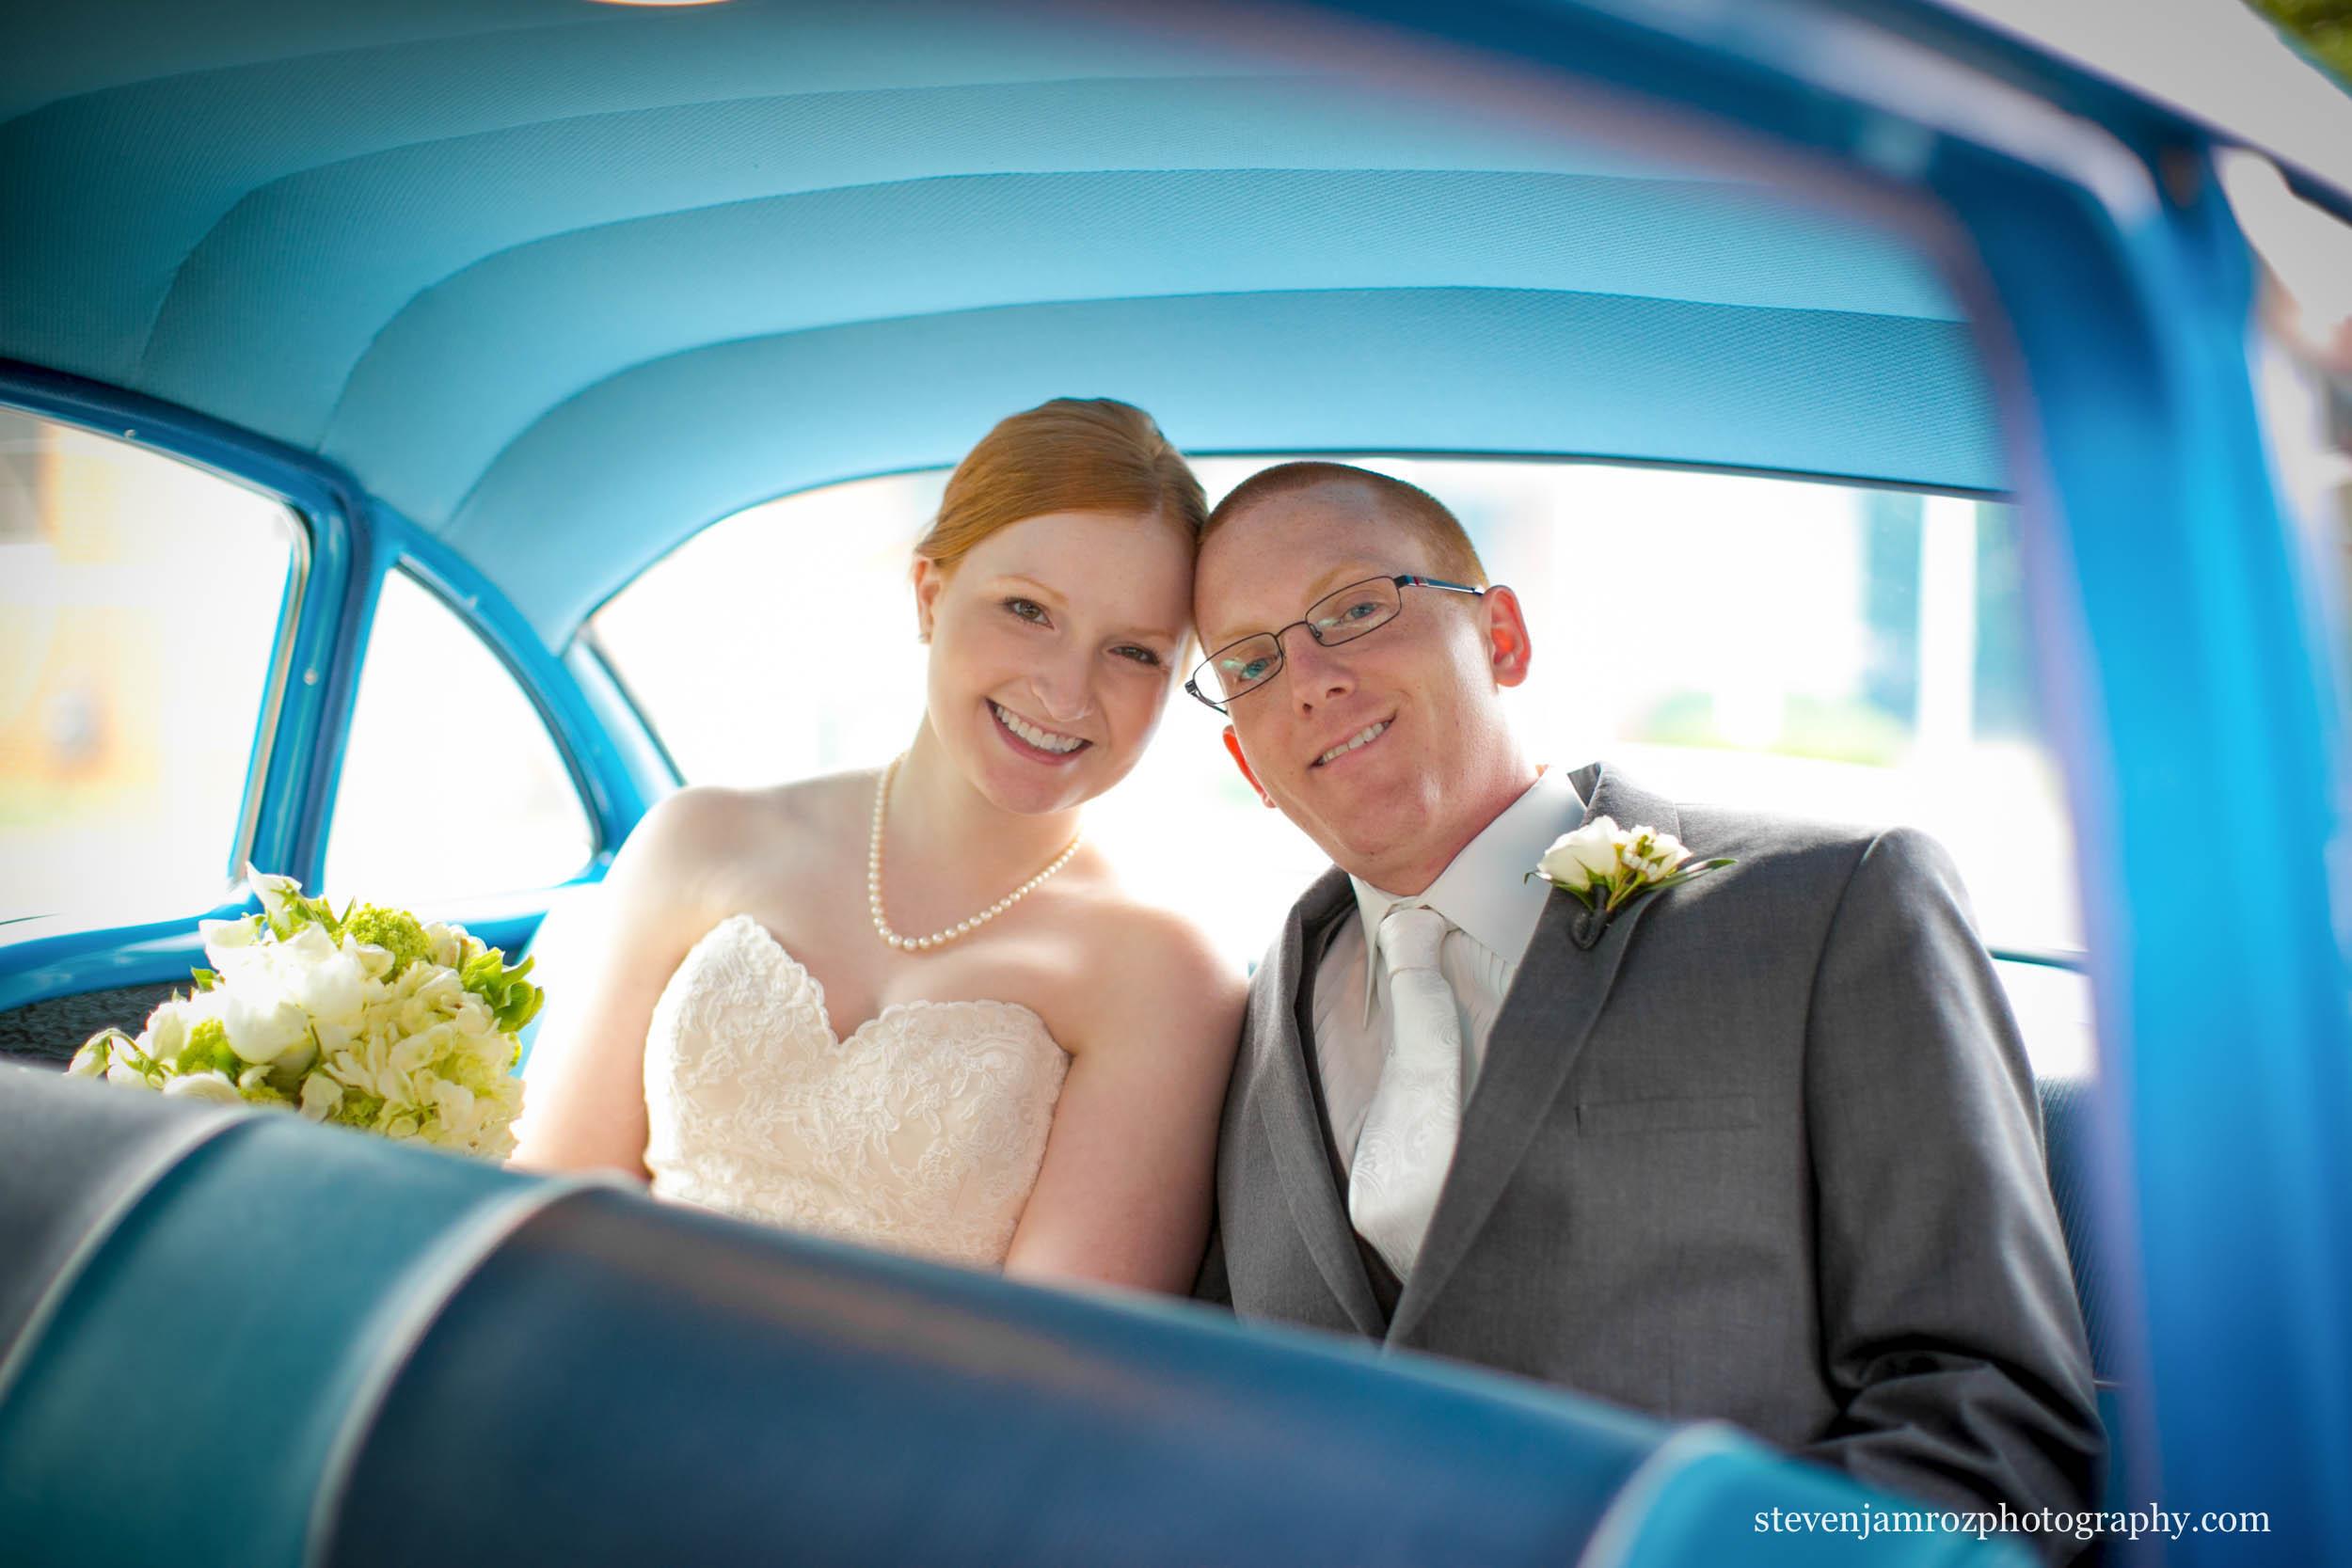 old-car-blue-wedding-couple-steven-jamroz-photography-0104.jpg